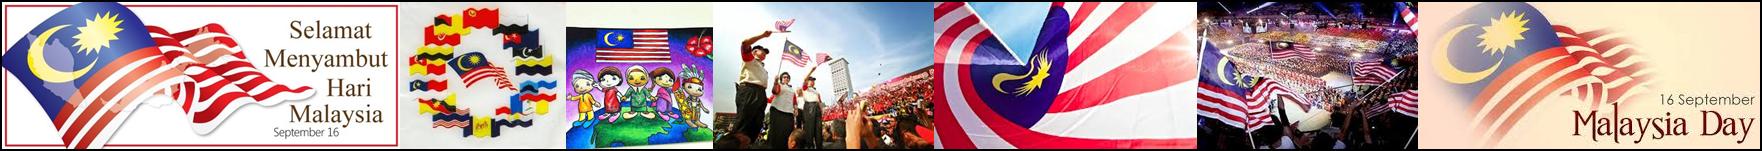 HARI MALAYSIA KE-51 : 16 SEPTEMBER 2014